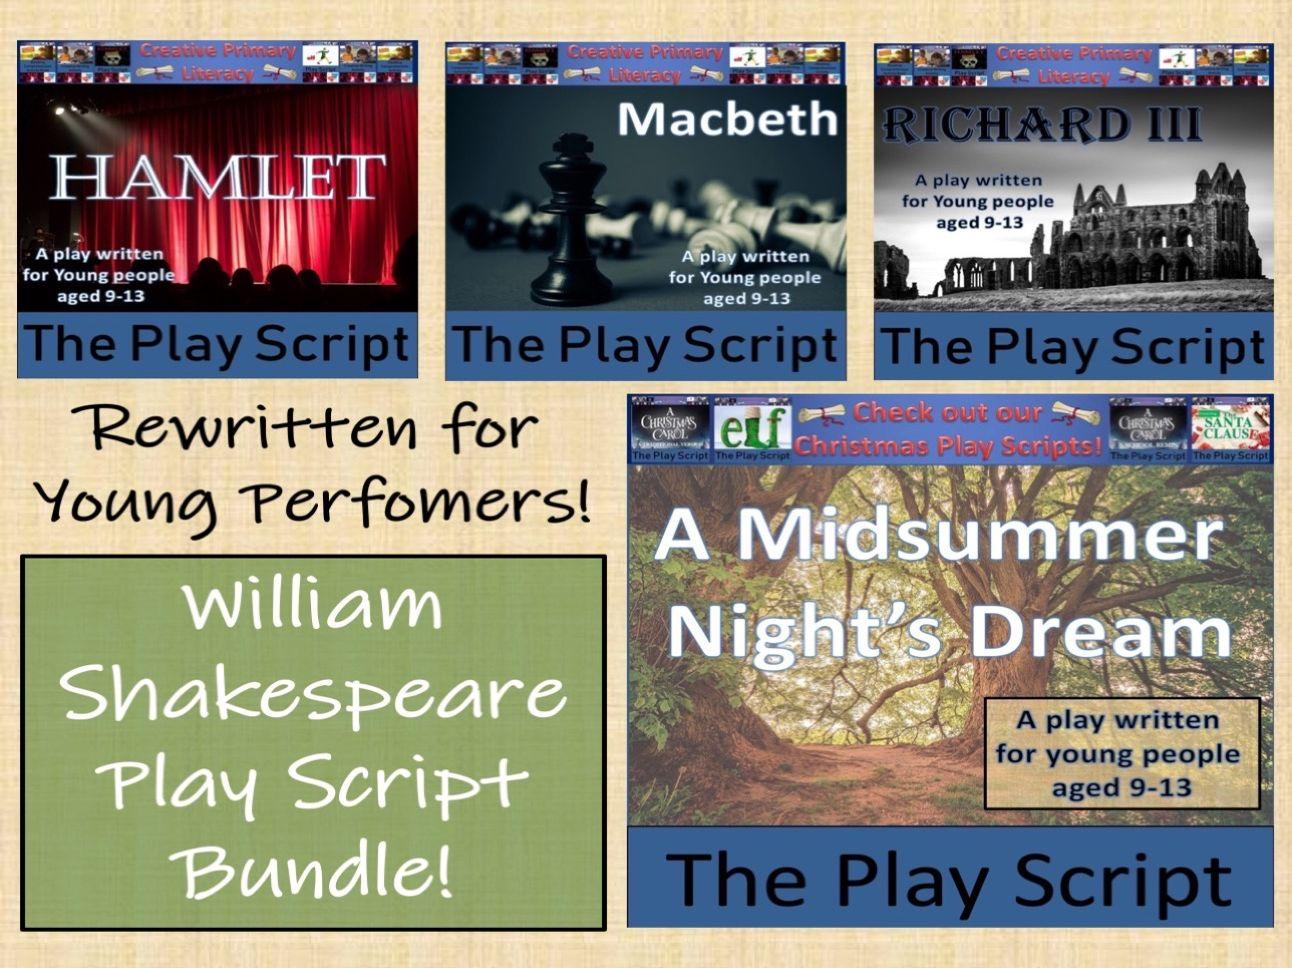 KS2 / KS3 Drama - Bundle of Four Shakespeare Play Scripts